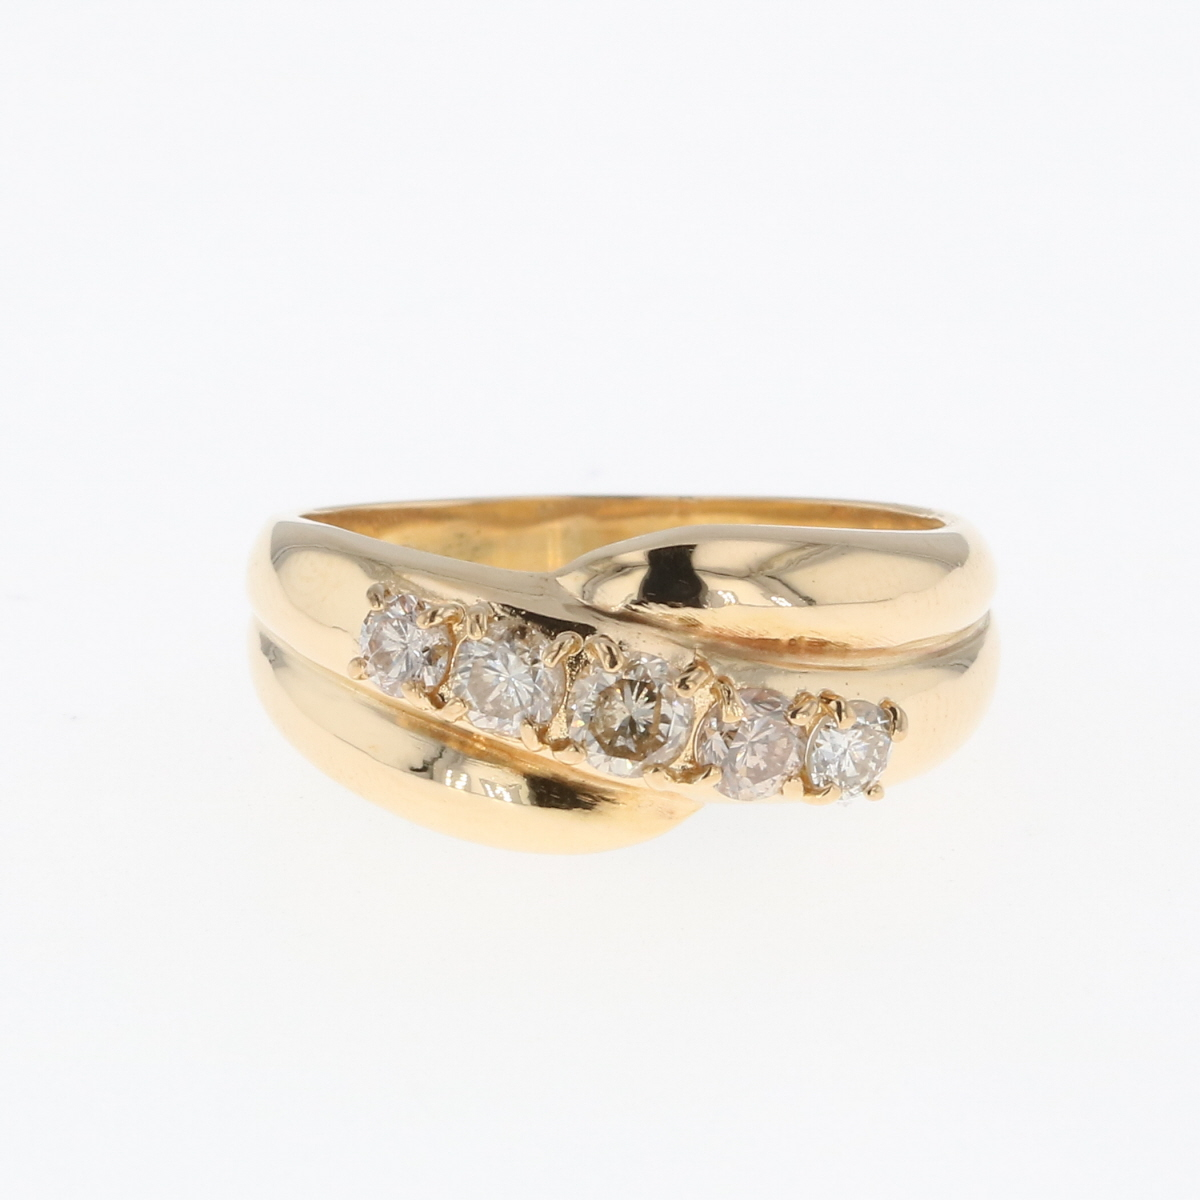 USED 卓抜 送料無料 賜物 メレダイヤ デザインリング K18 イエローゴールド 指輪 リング レディース 中古 ダイヤモンド YG 11号